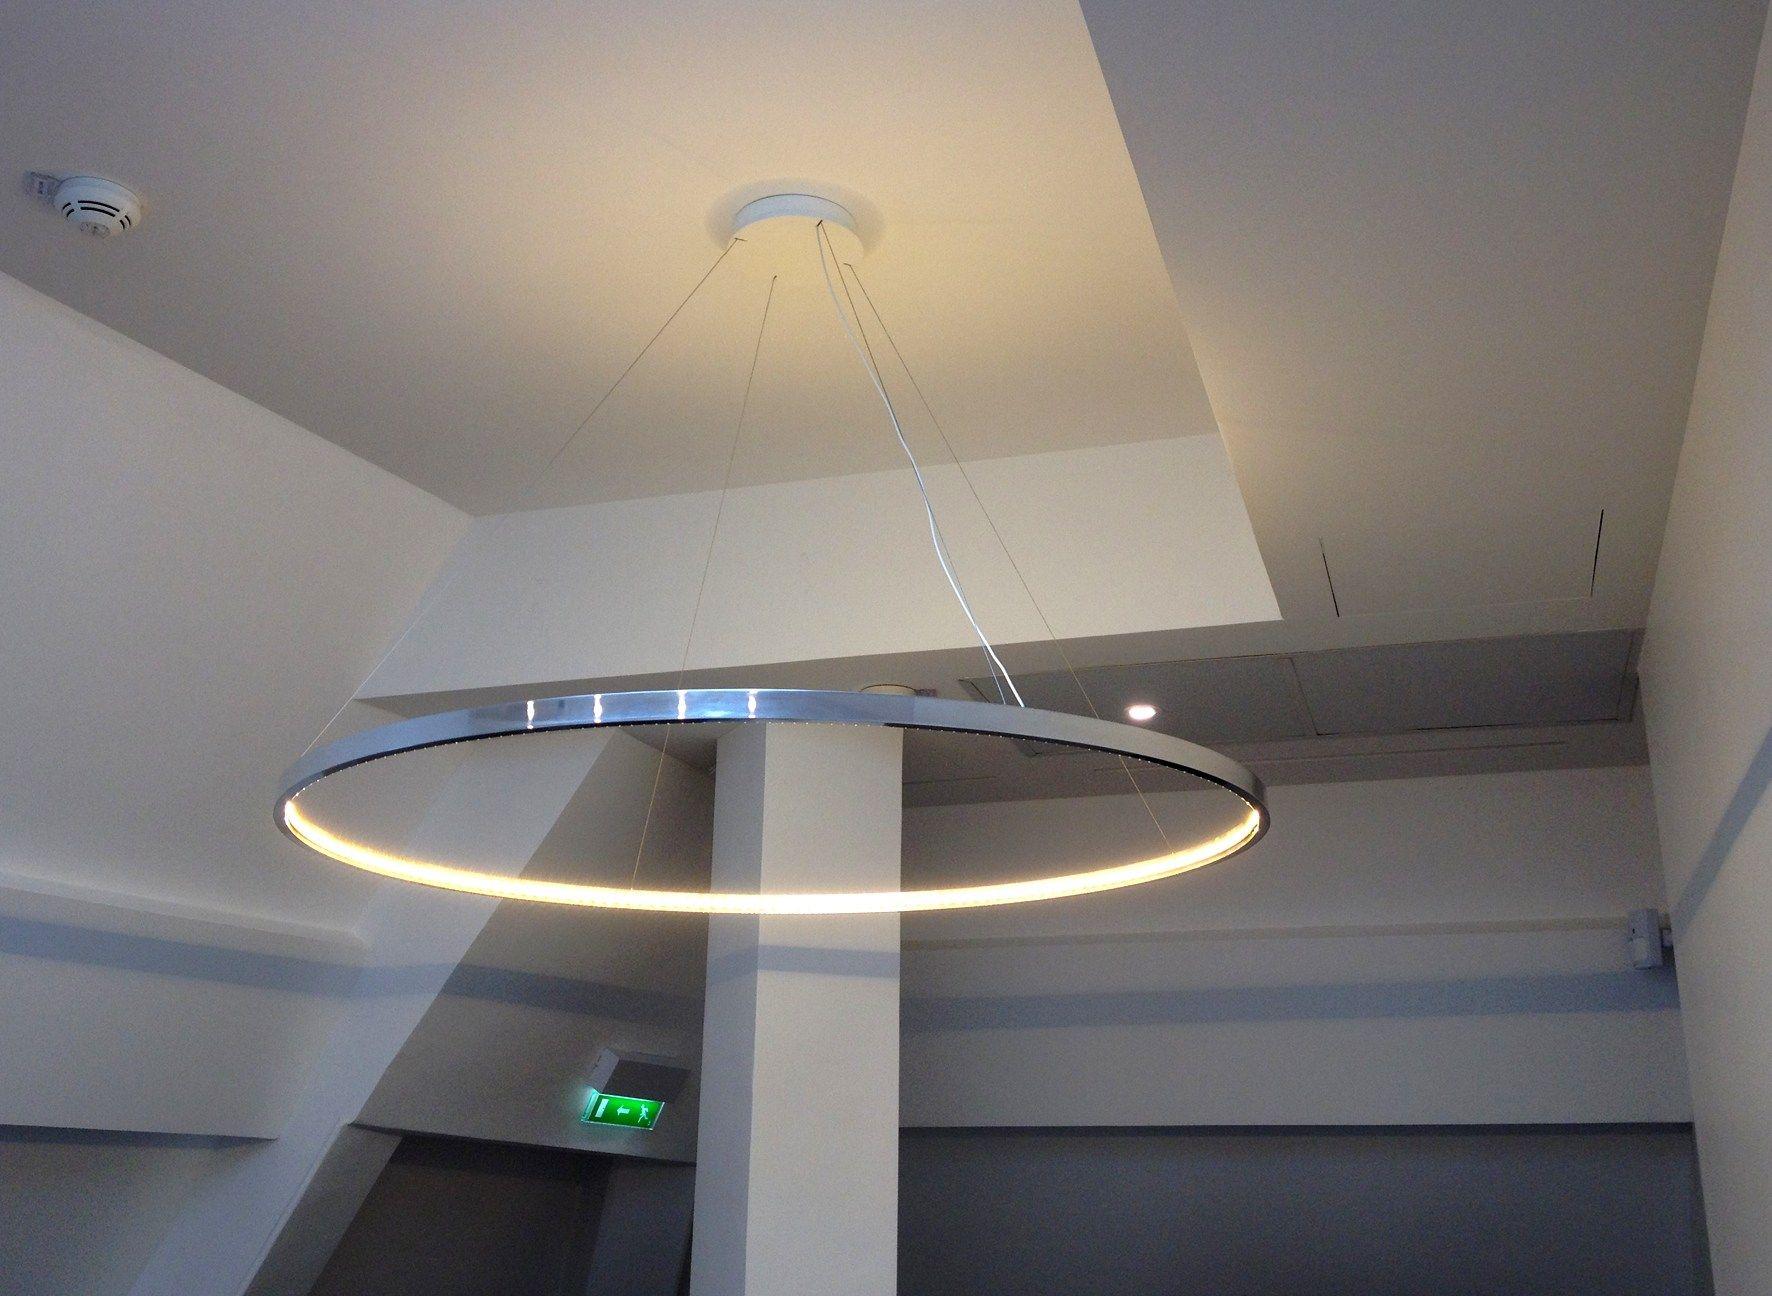 Led Direct Indirect Light Pendant Lamp Omega 120 By Le Deun Luminaires Pendant Lamp Pendant Lighting Indoor Lighting